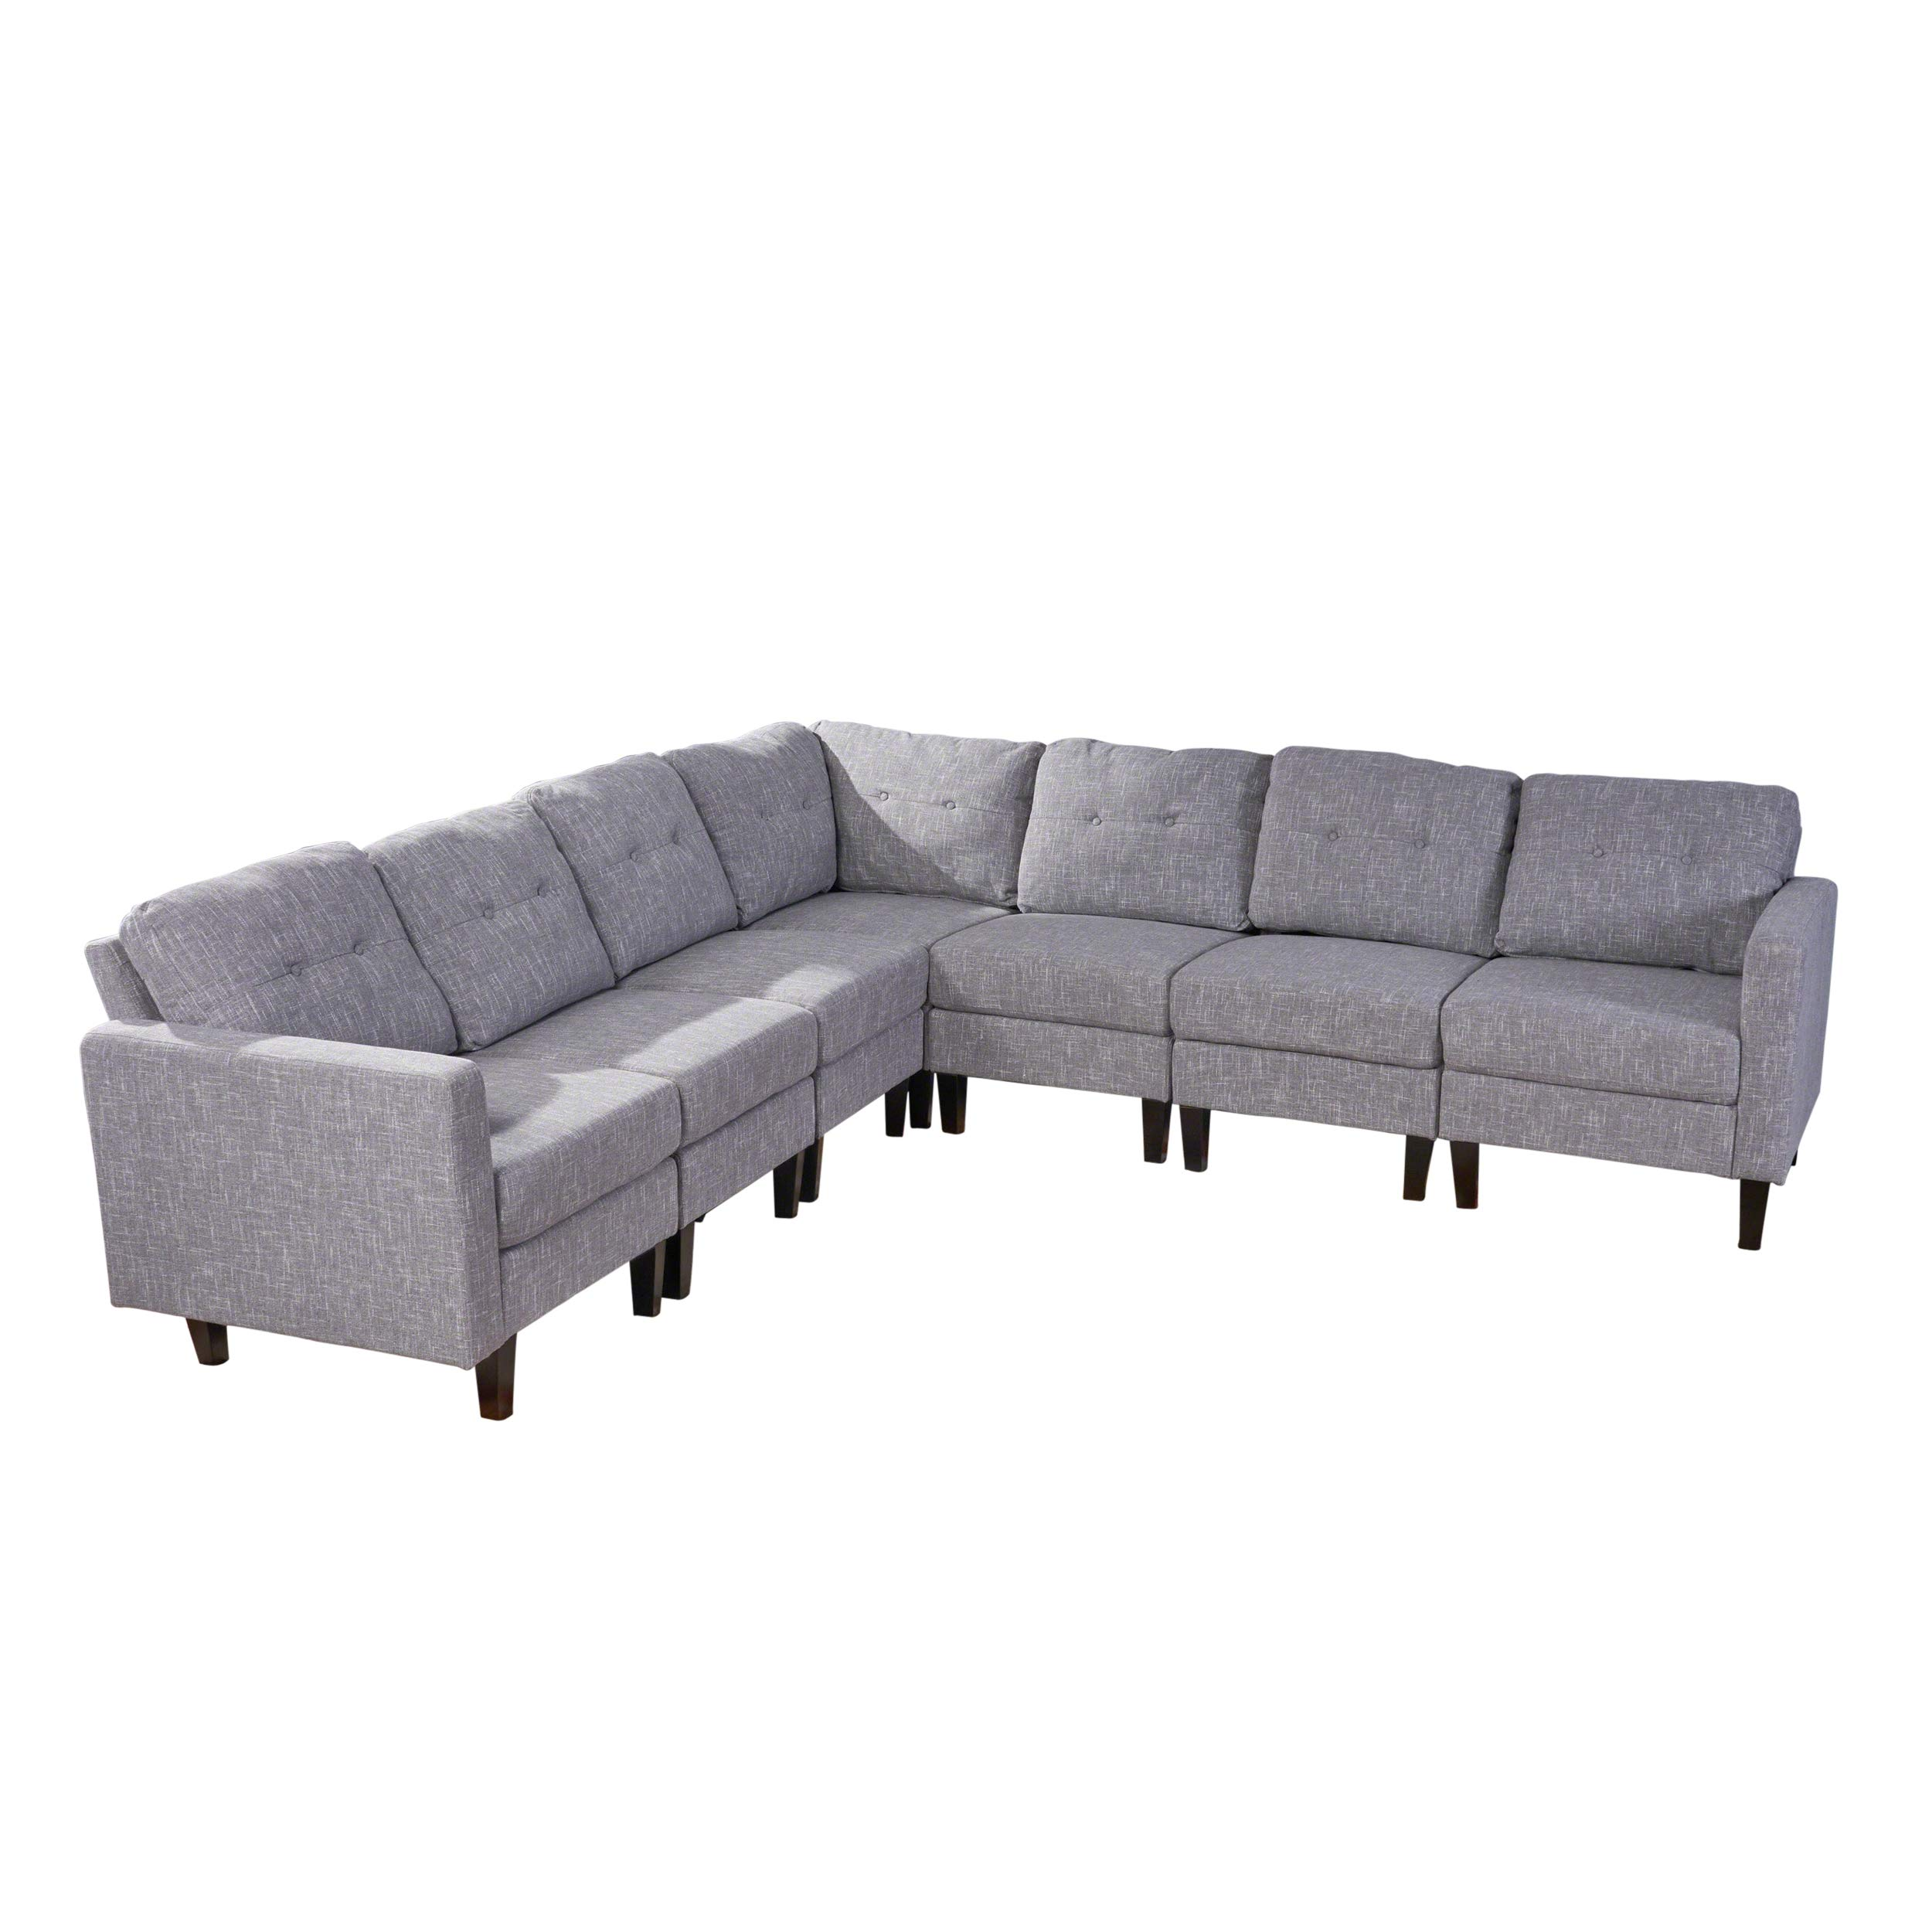 Christopher Knight Home Marsh Mid Century Modern Extended Sectional Sofa Set, Gray Tweed, Dark Brown by Christopher Knight Home